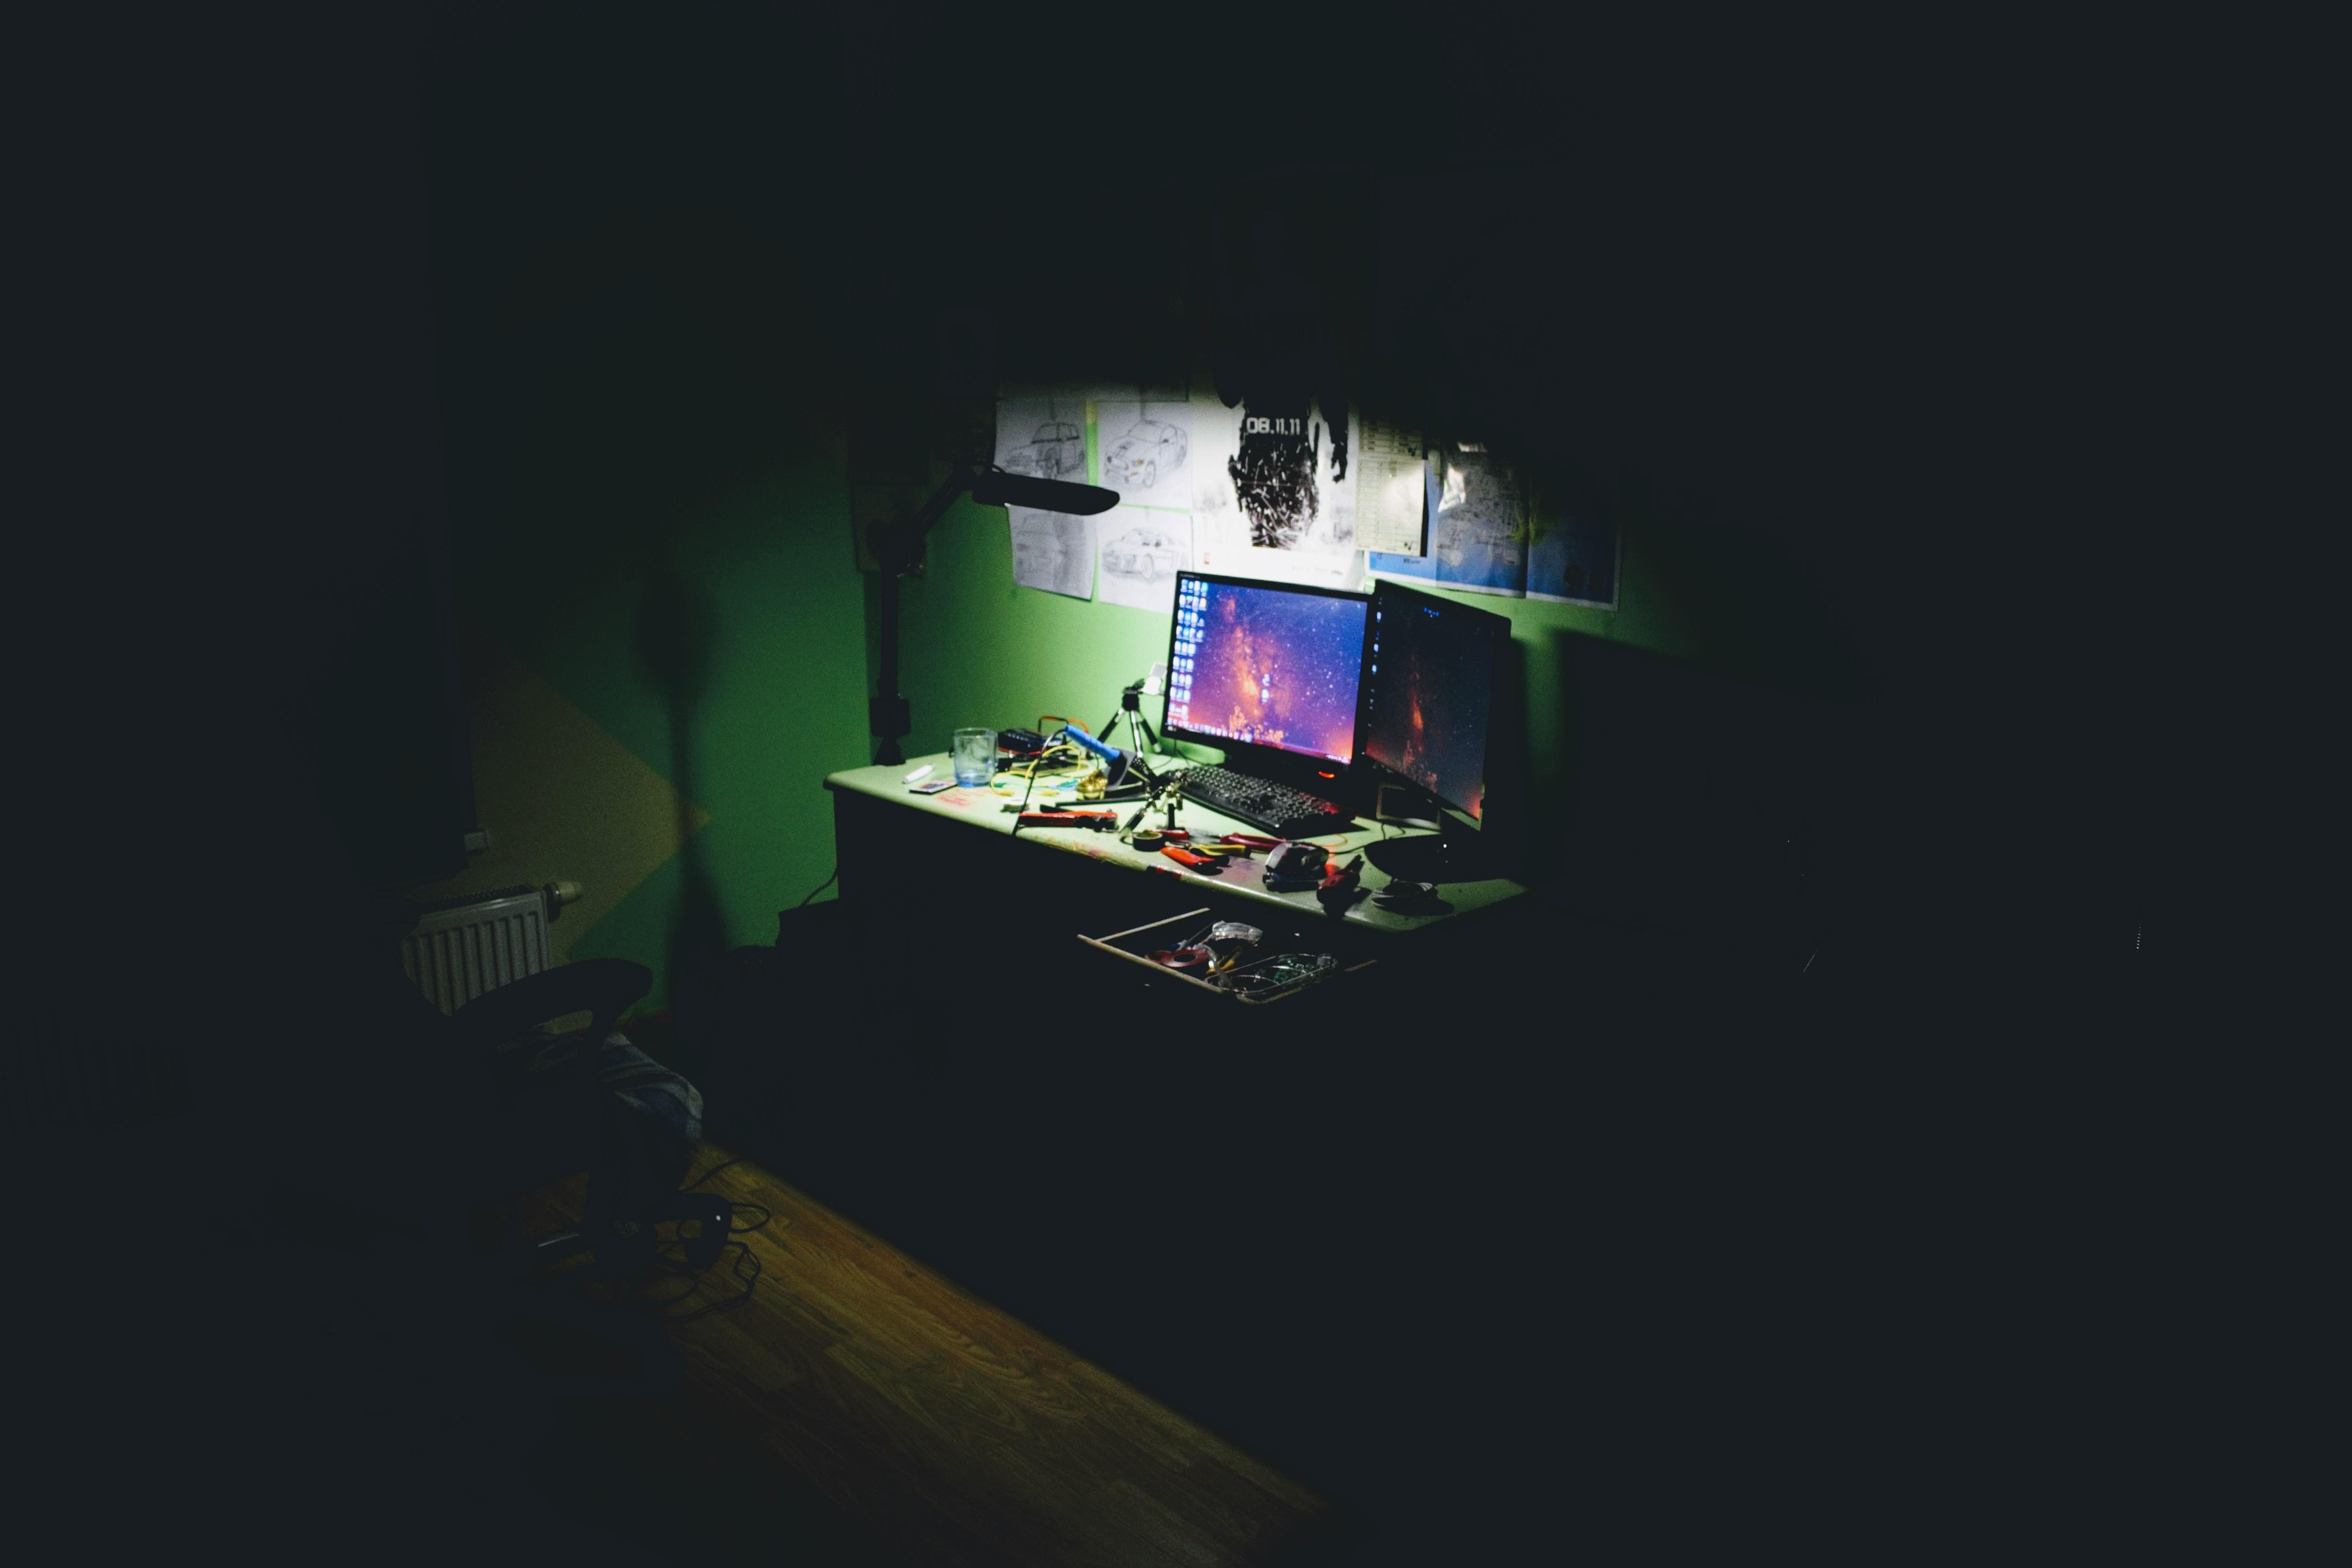 flat screen computer monitors on table